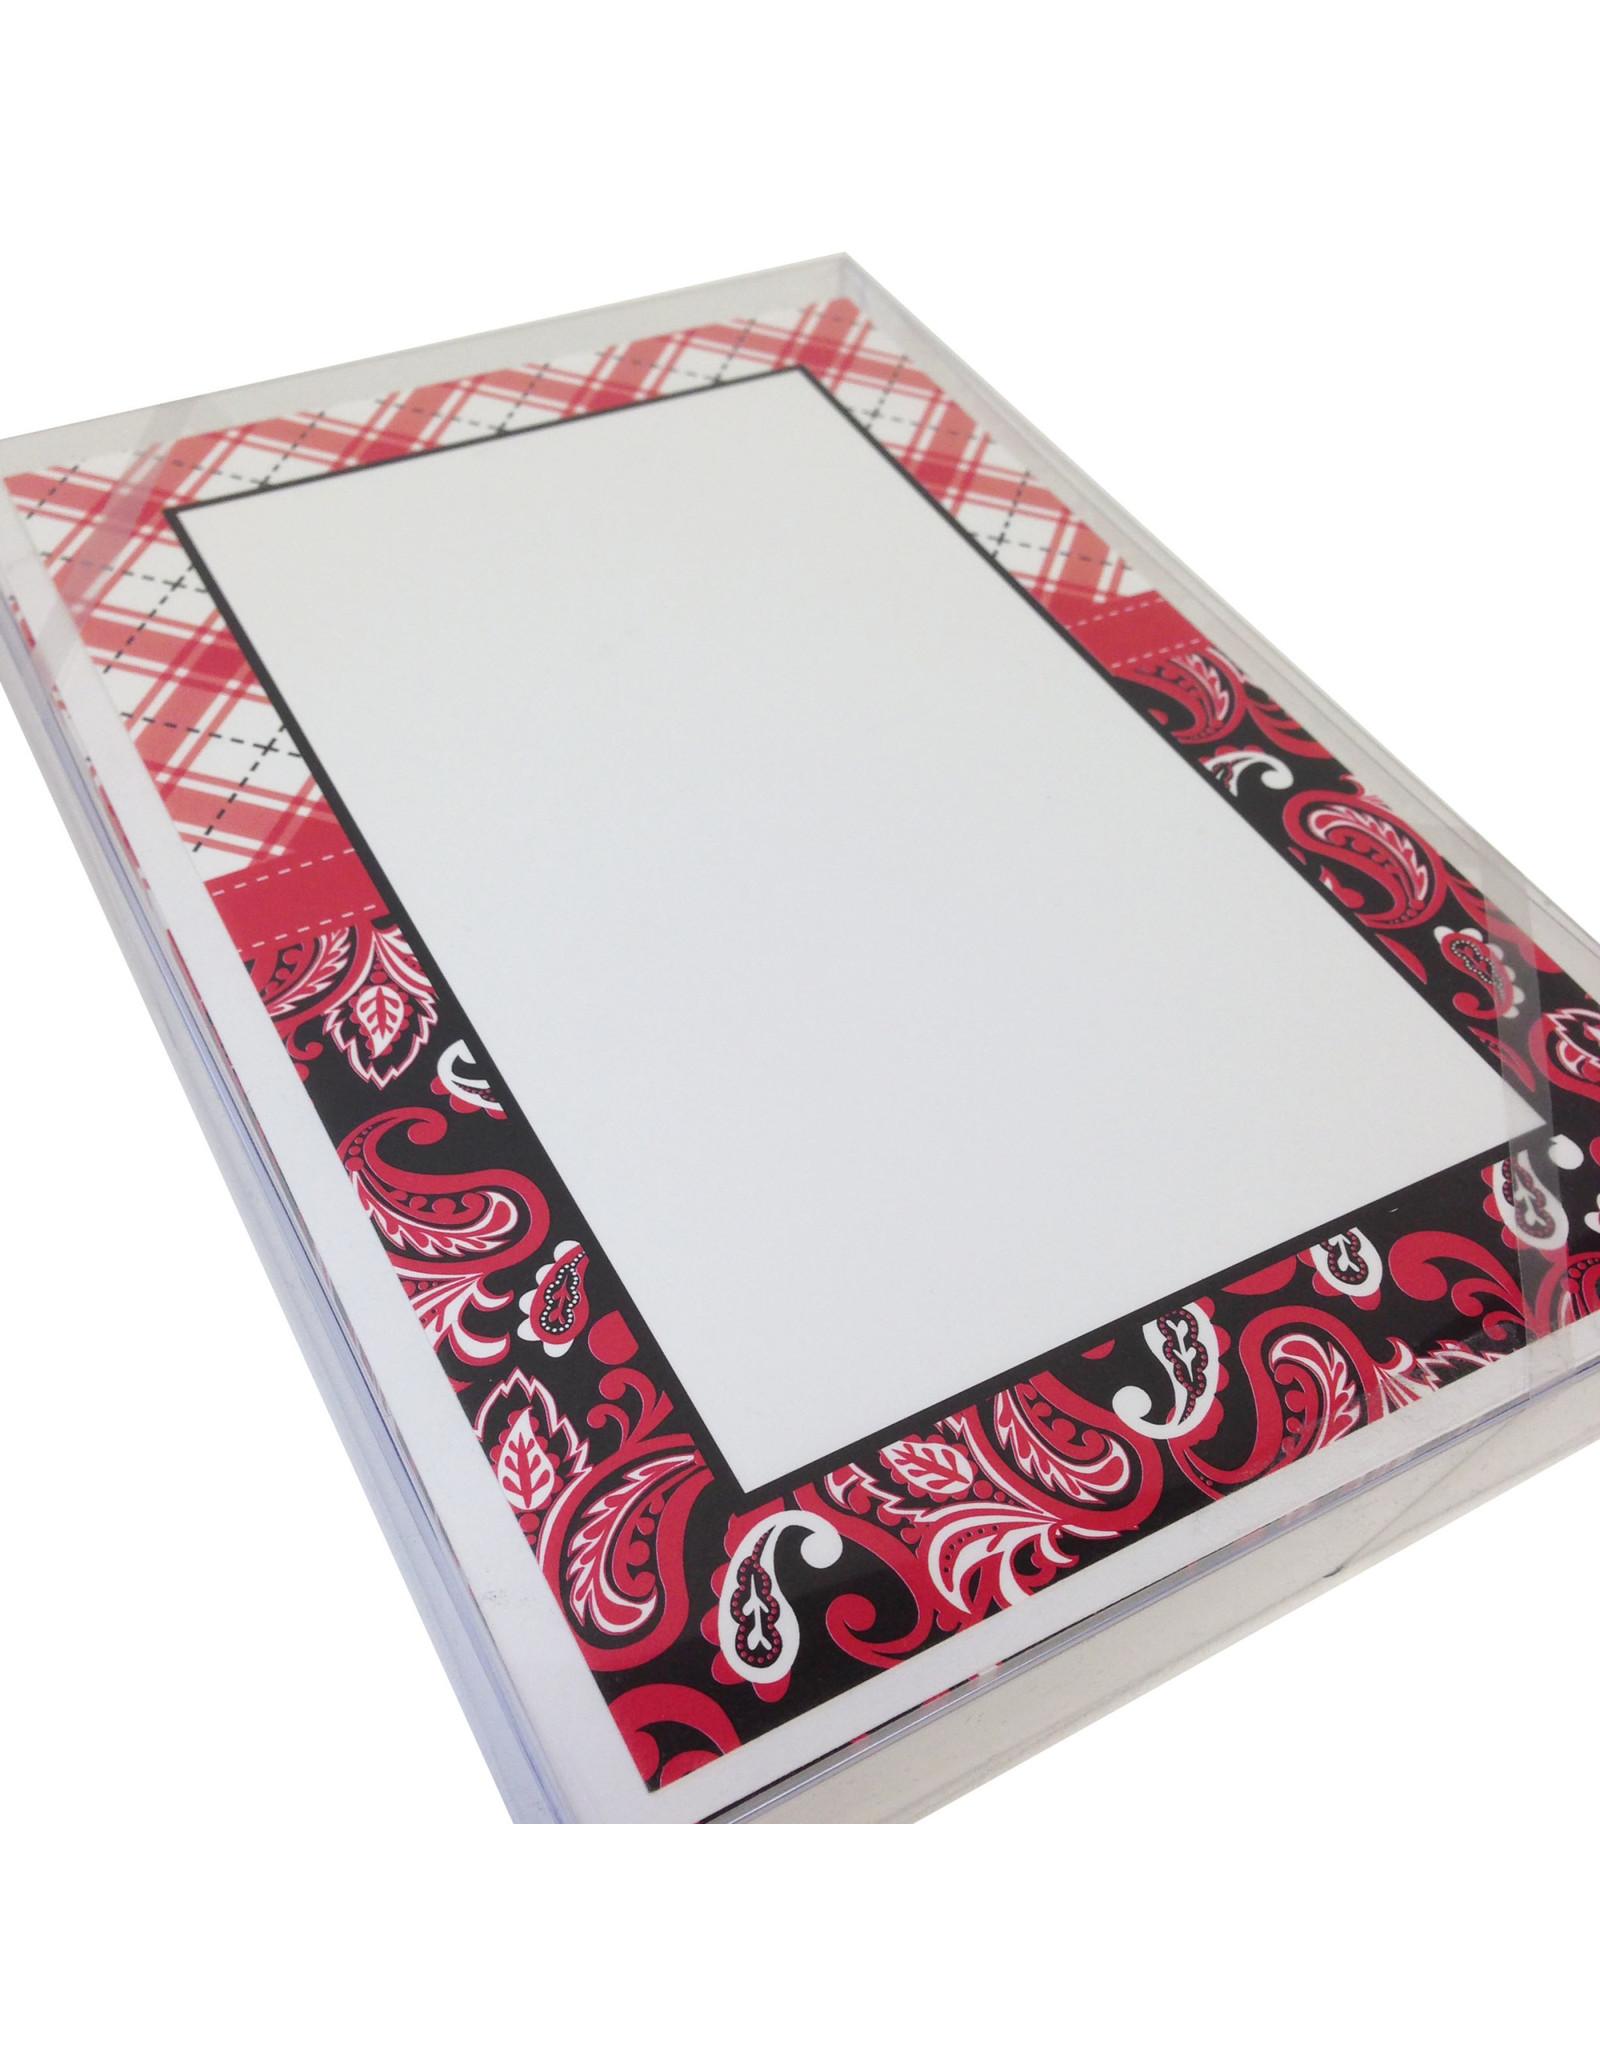 Invitation - RBW Blank Box (Qty 20)